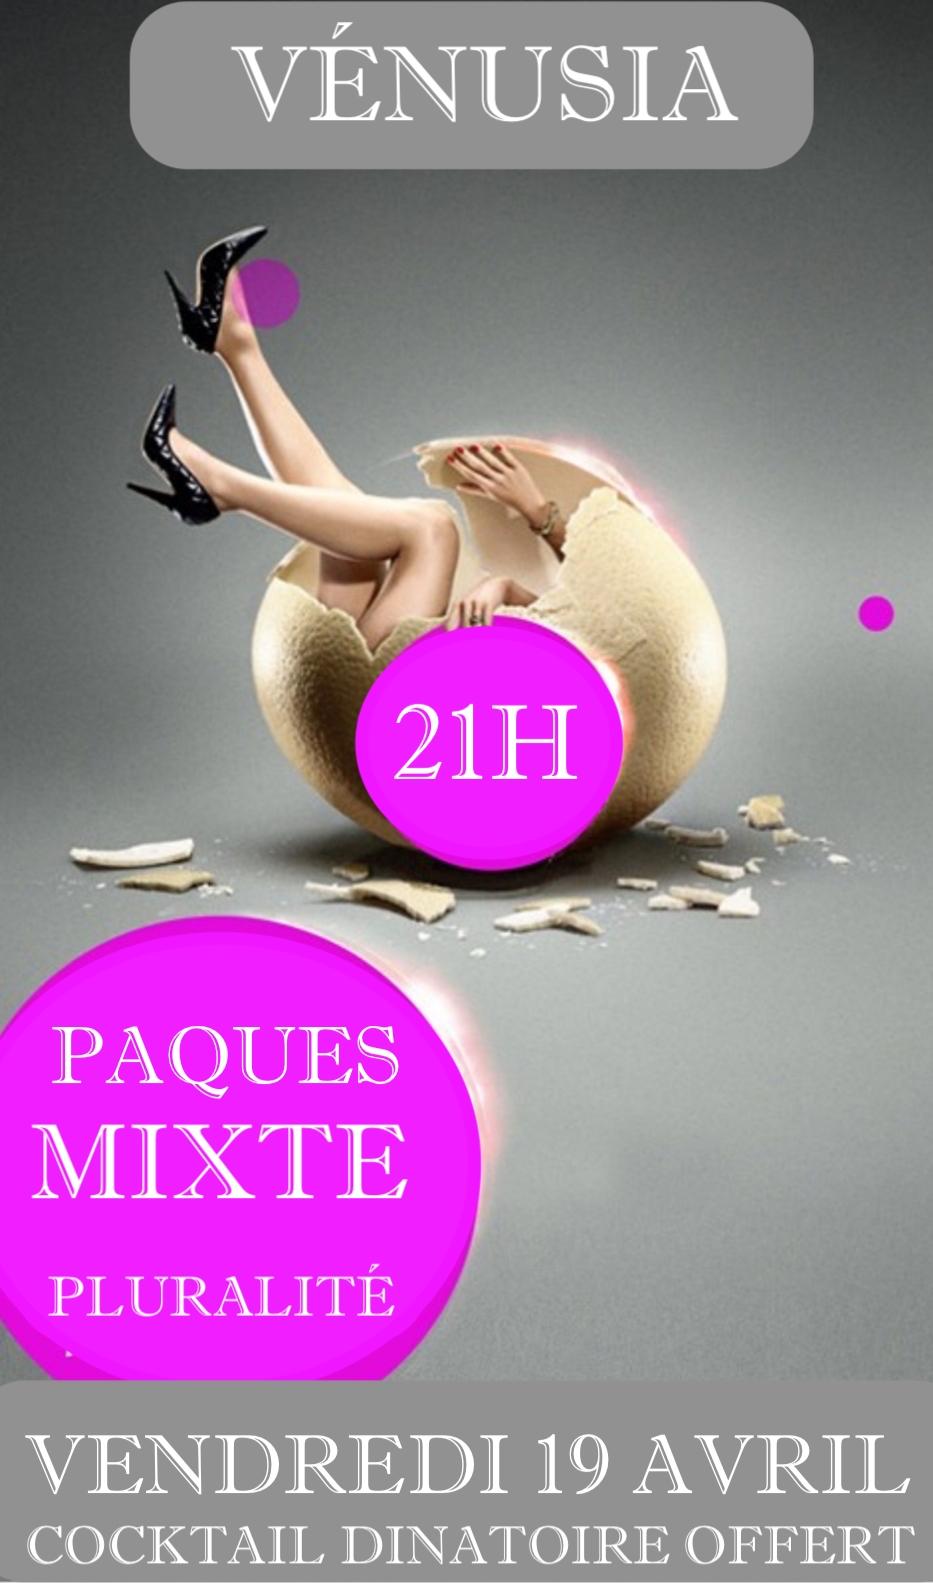 PAQUES MIXTE